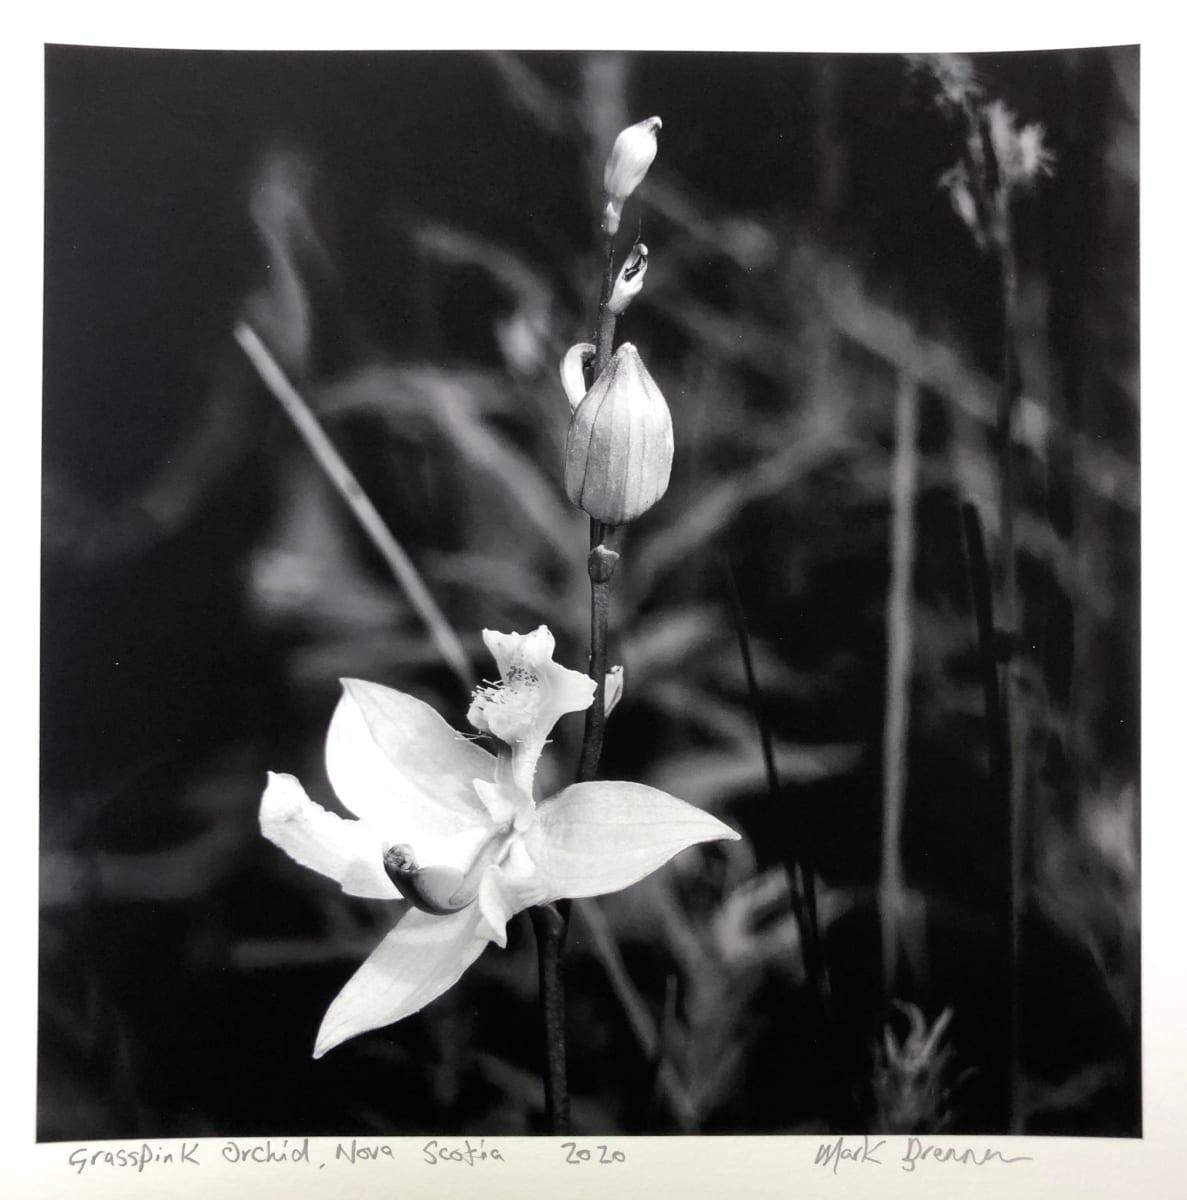 Grasspink Orchid, Nova Scotia by Mark Brennan